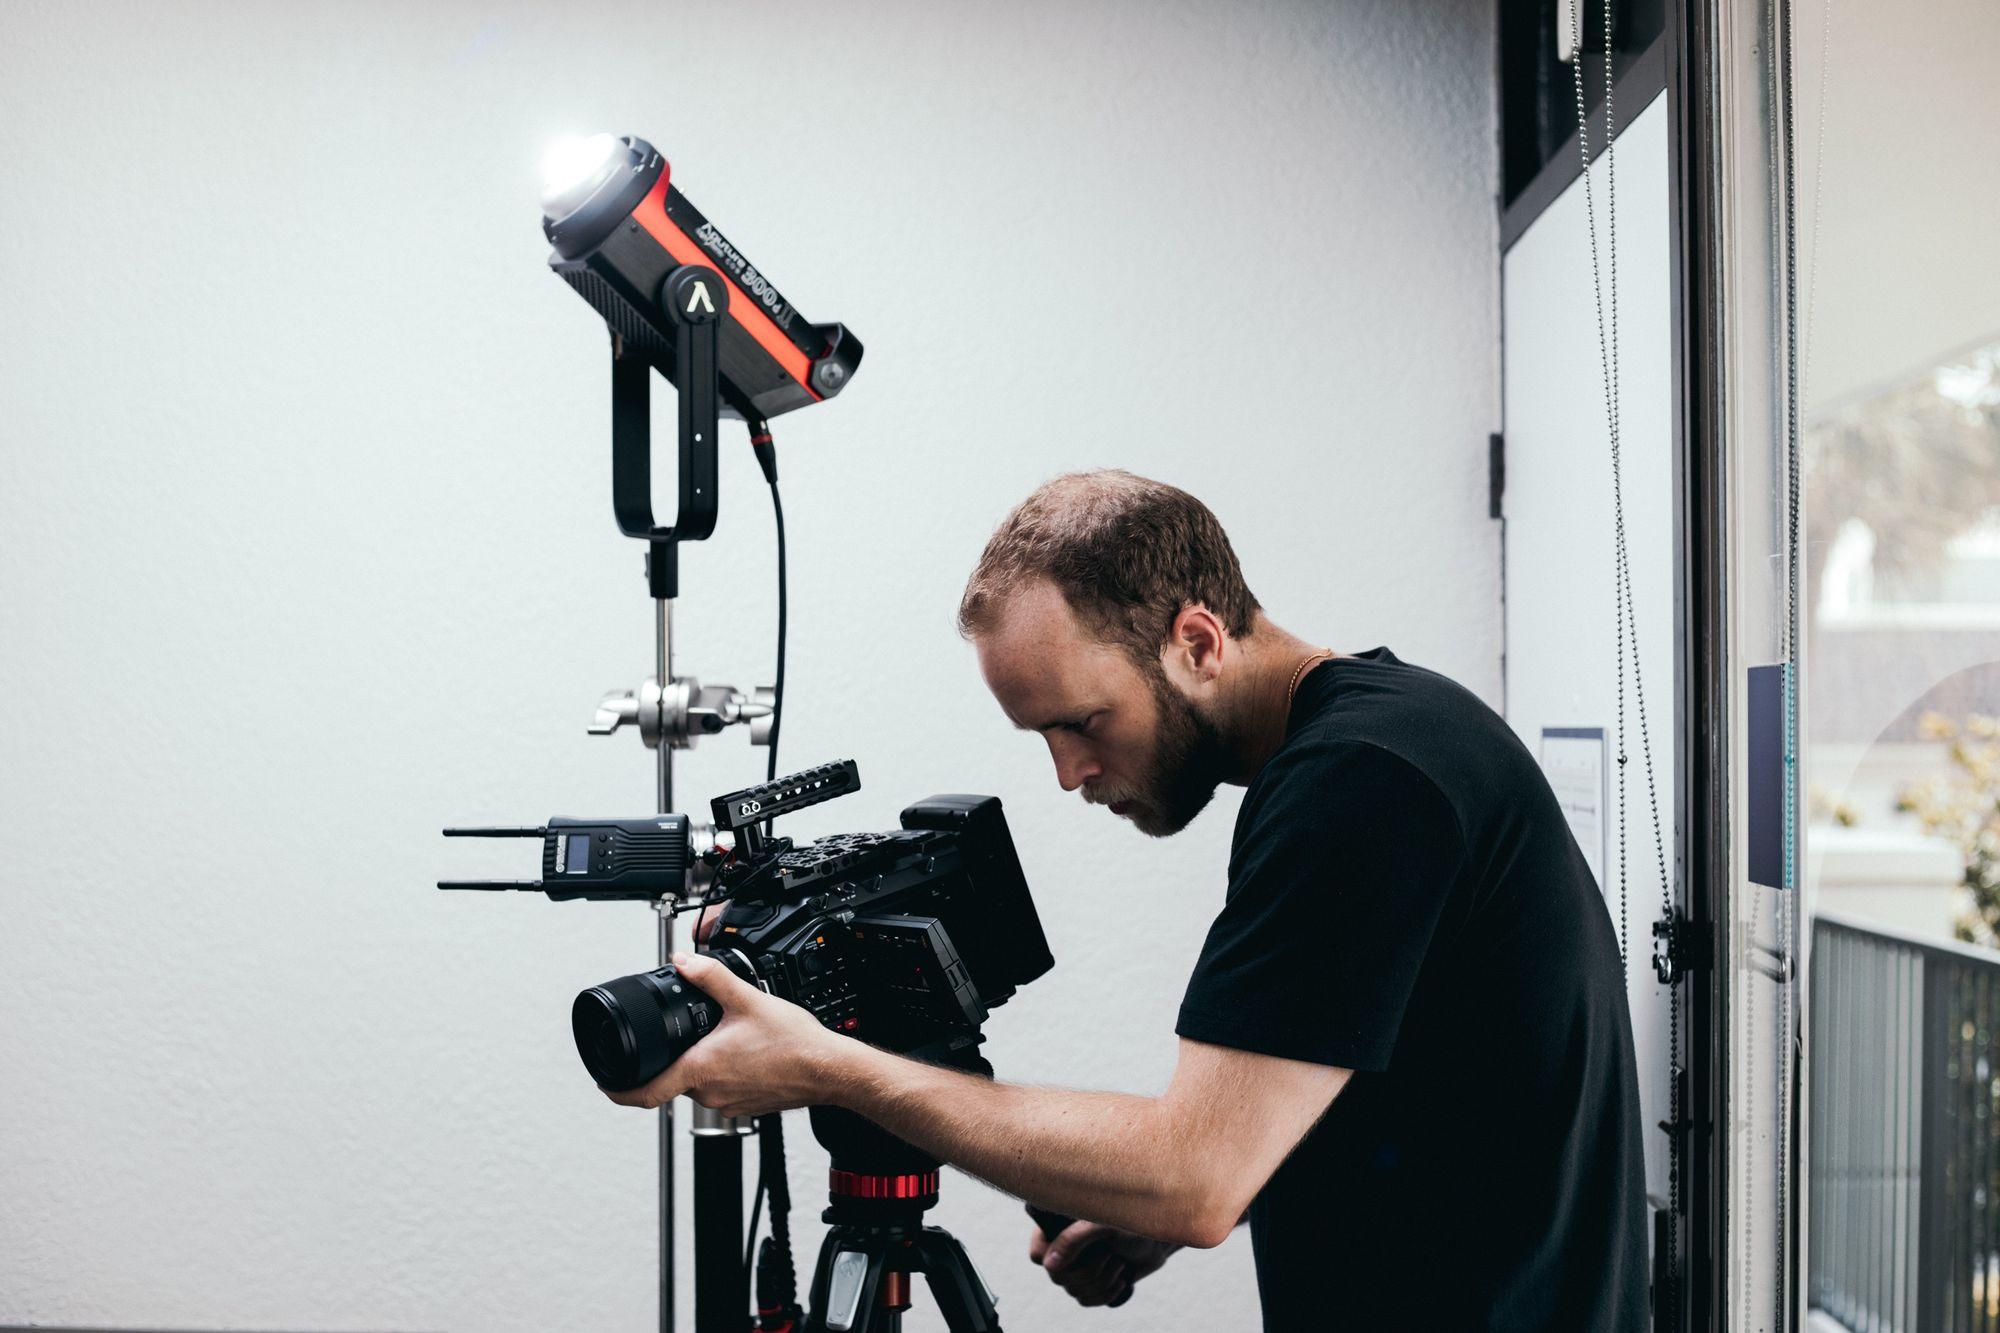 man-checking-camera-equipment